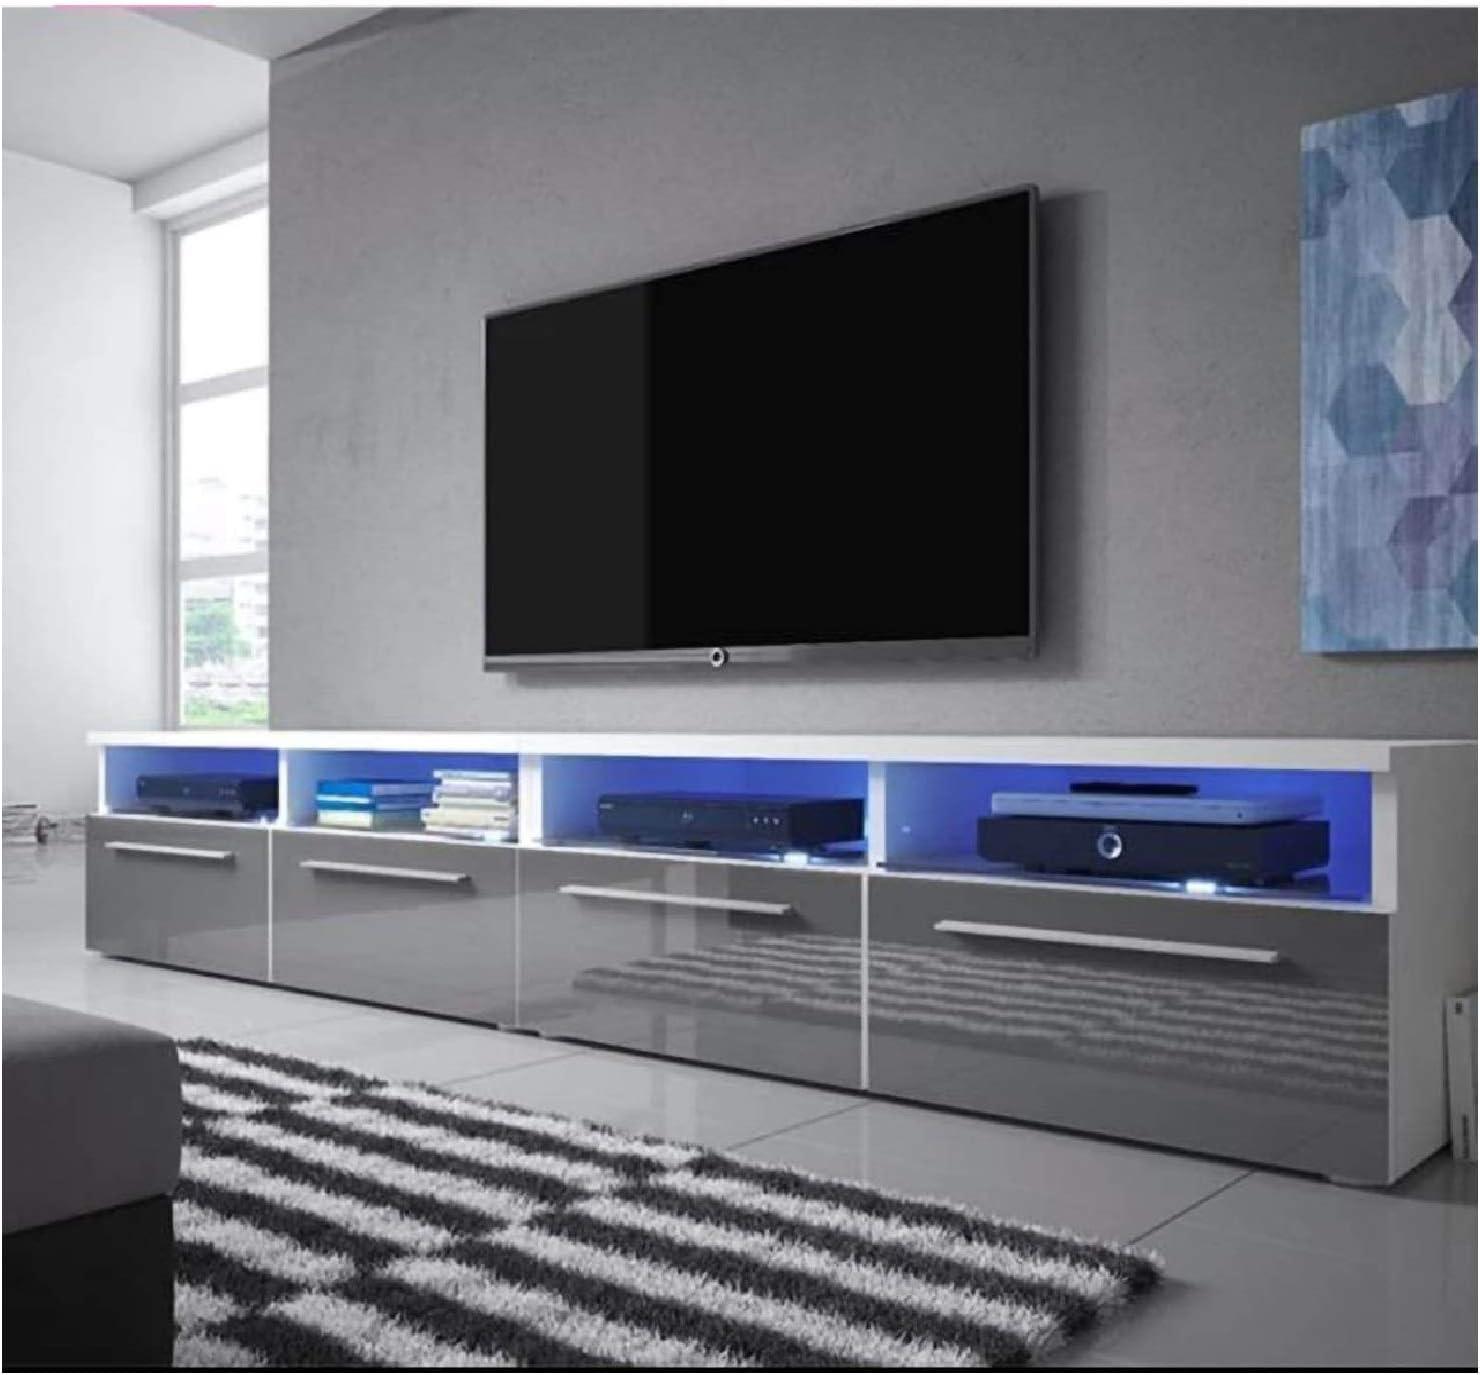 Tv Unit Cabinet Tv Stand Matt Body High Gloss Doors Blue Light Tv Living Room Entertainment Center Media Kitchen Dining